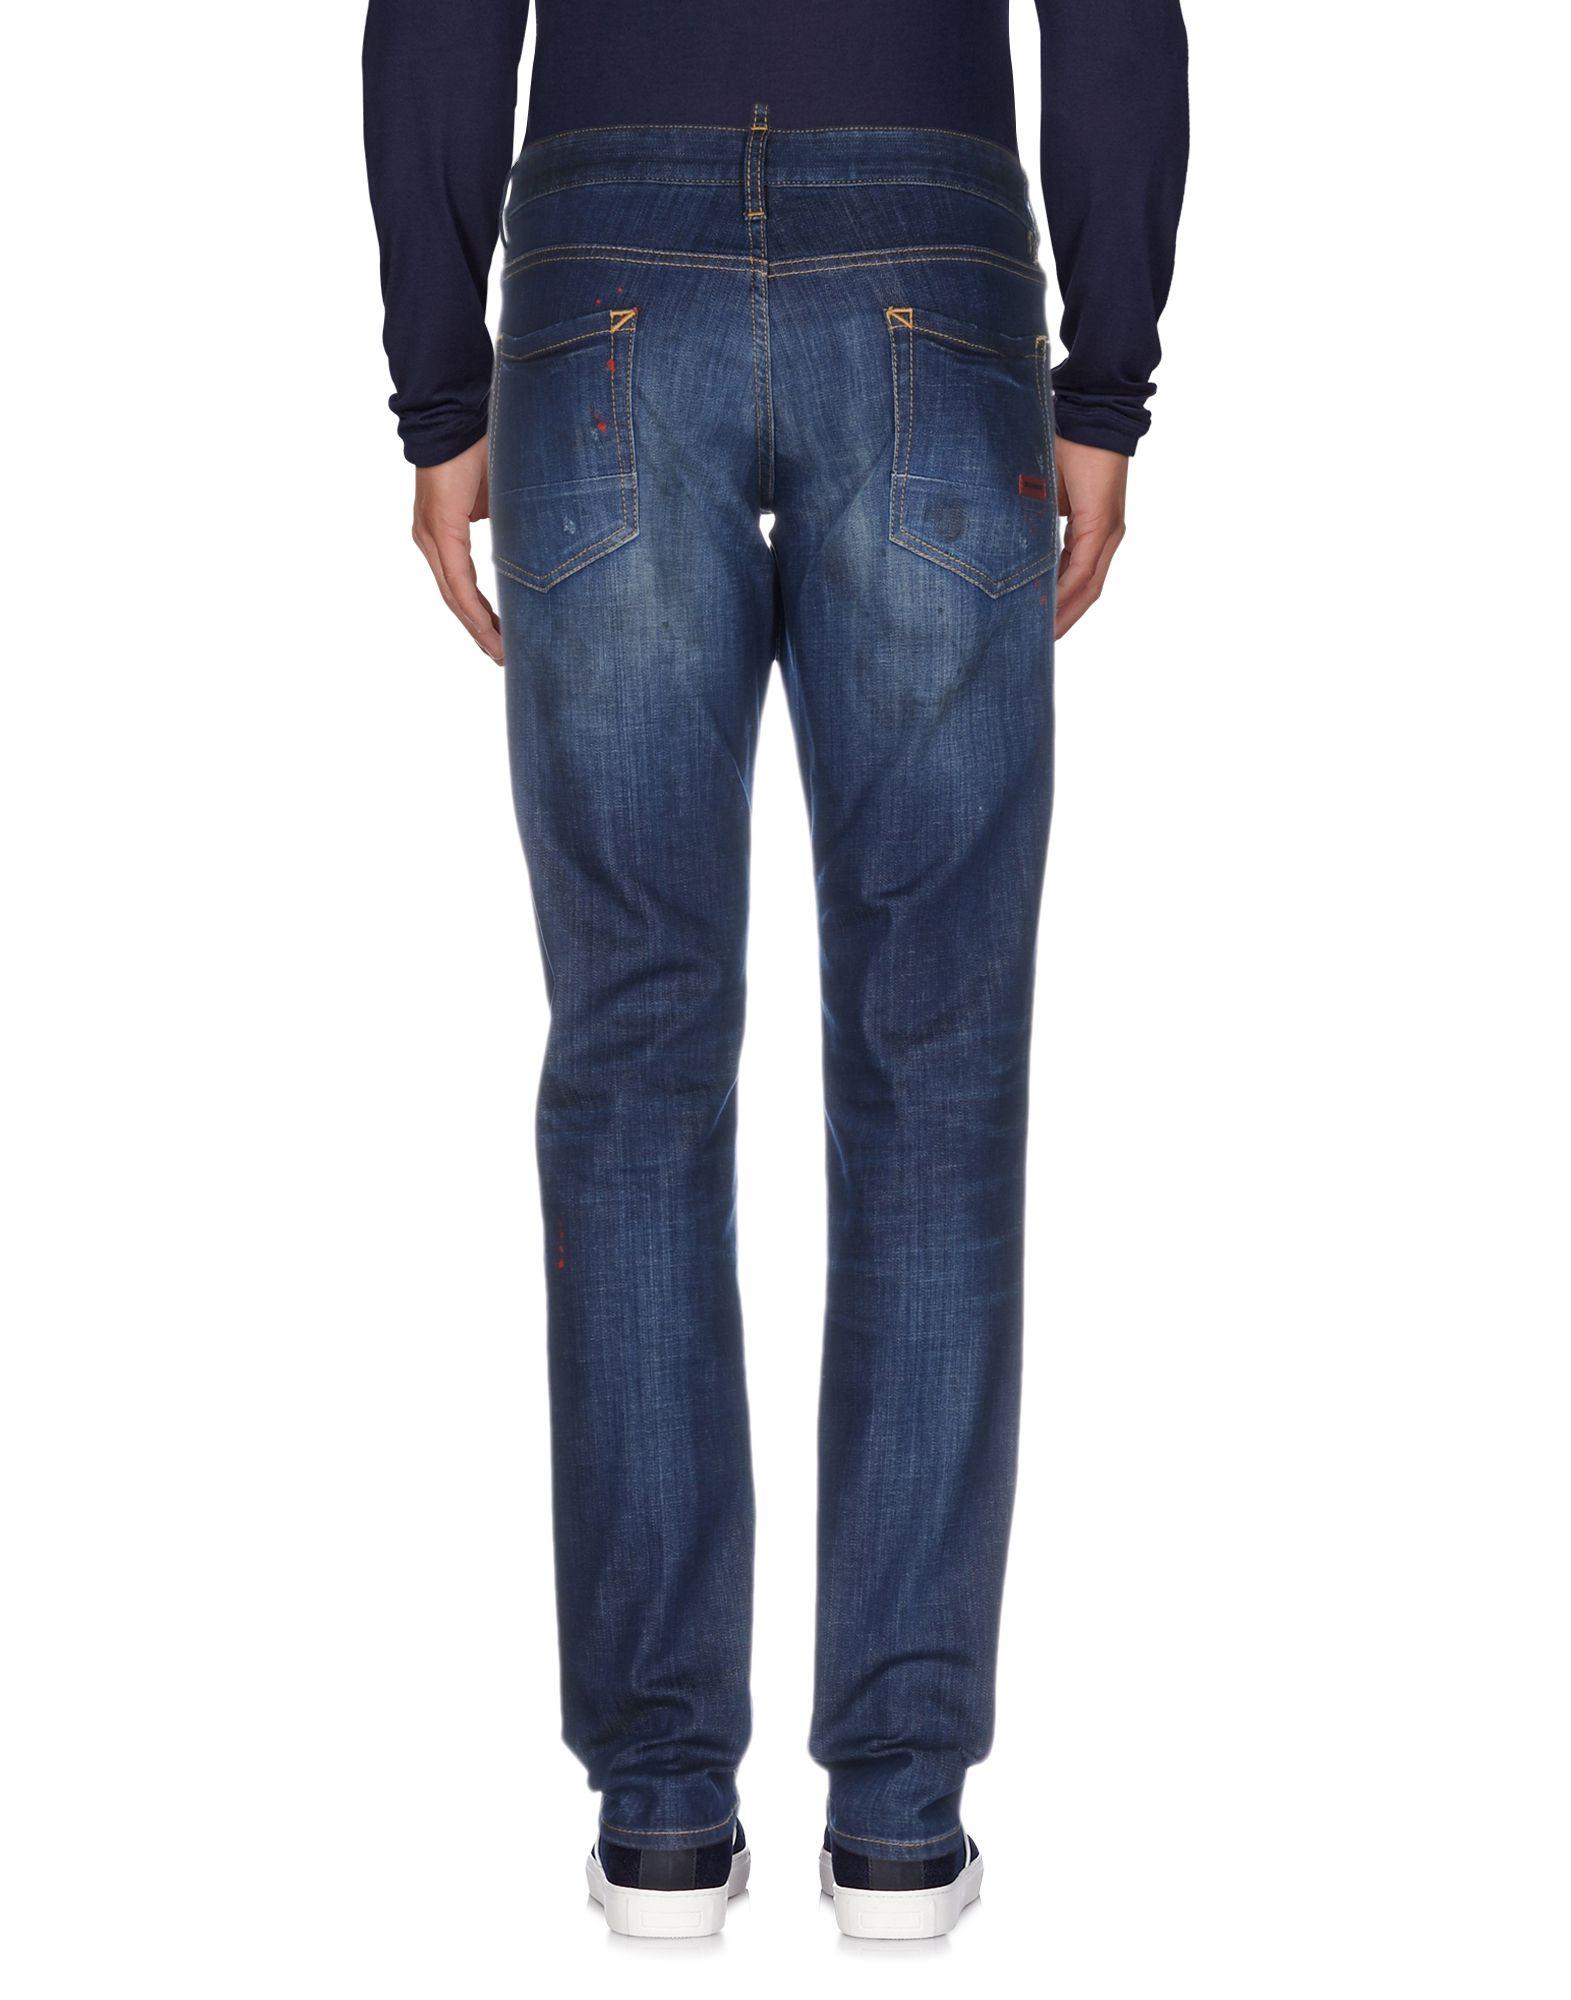 Pantaloni Uomo Jeans Dsquarosso2 Uomo Pantaloni - 42501549DS 227c45